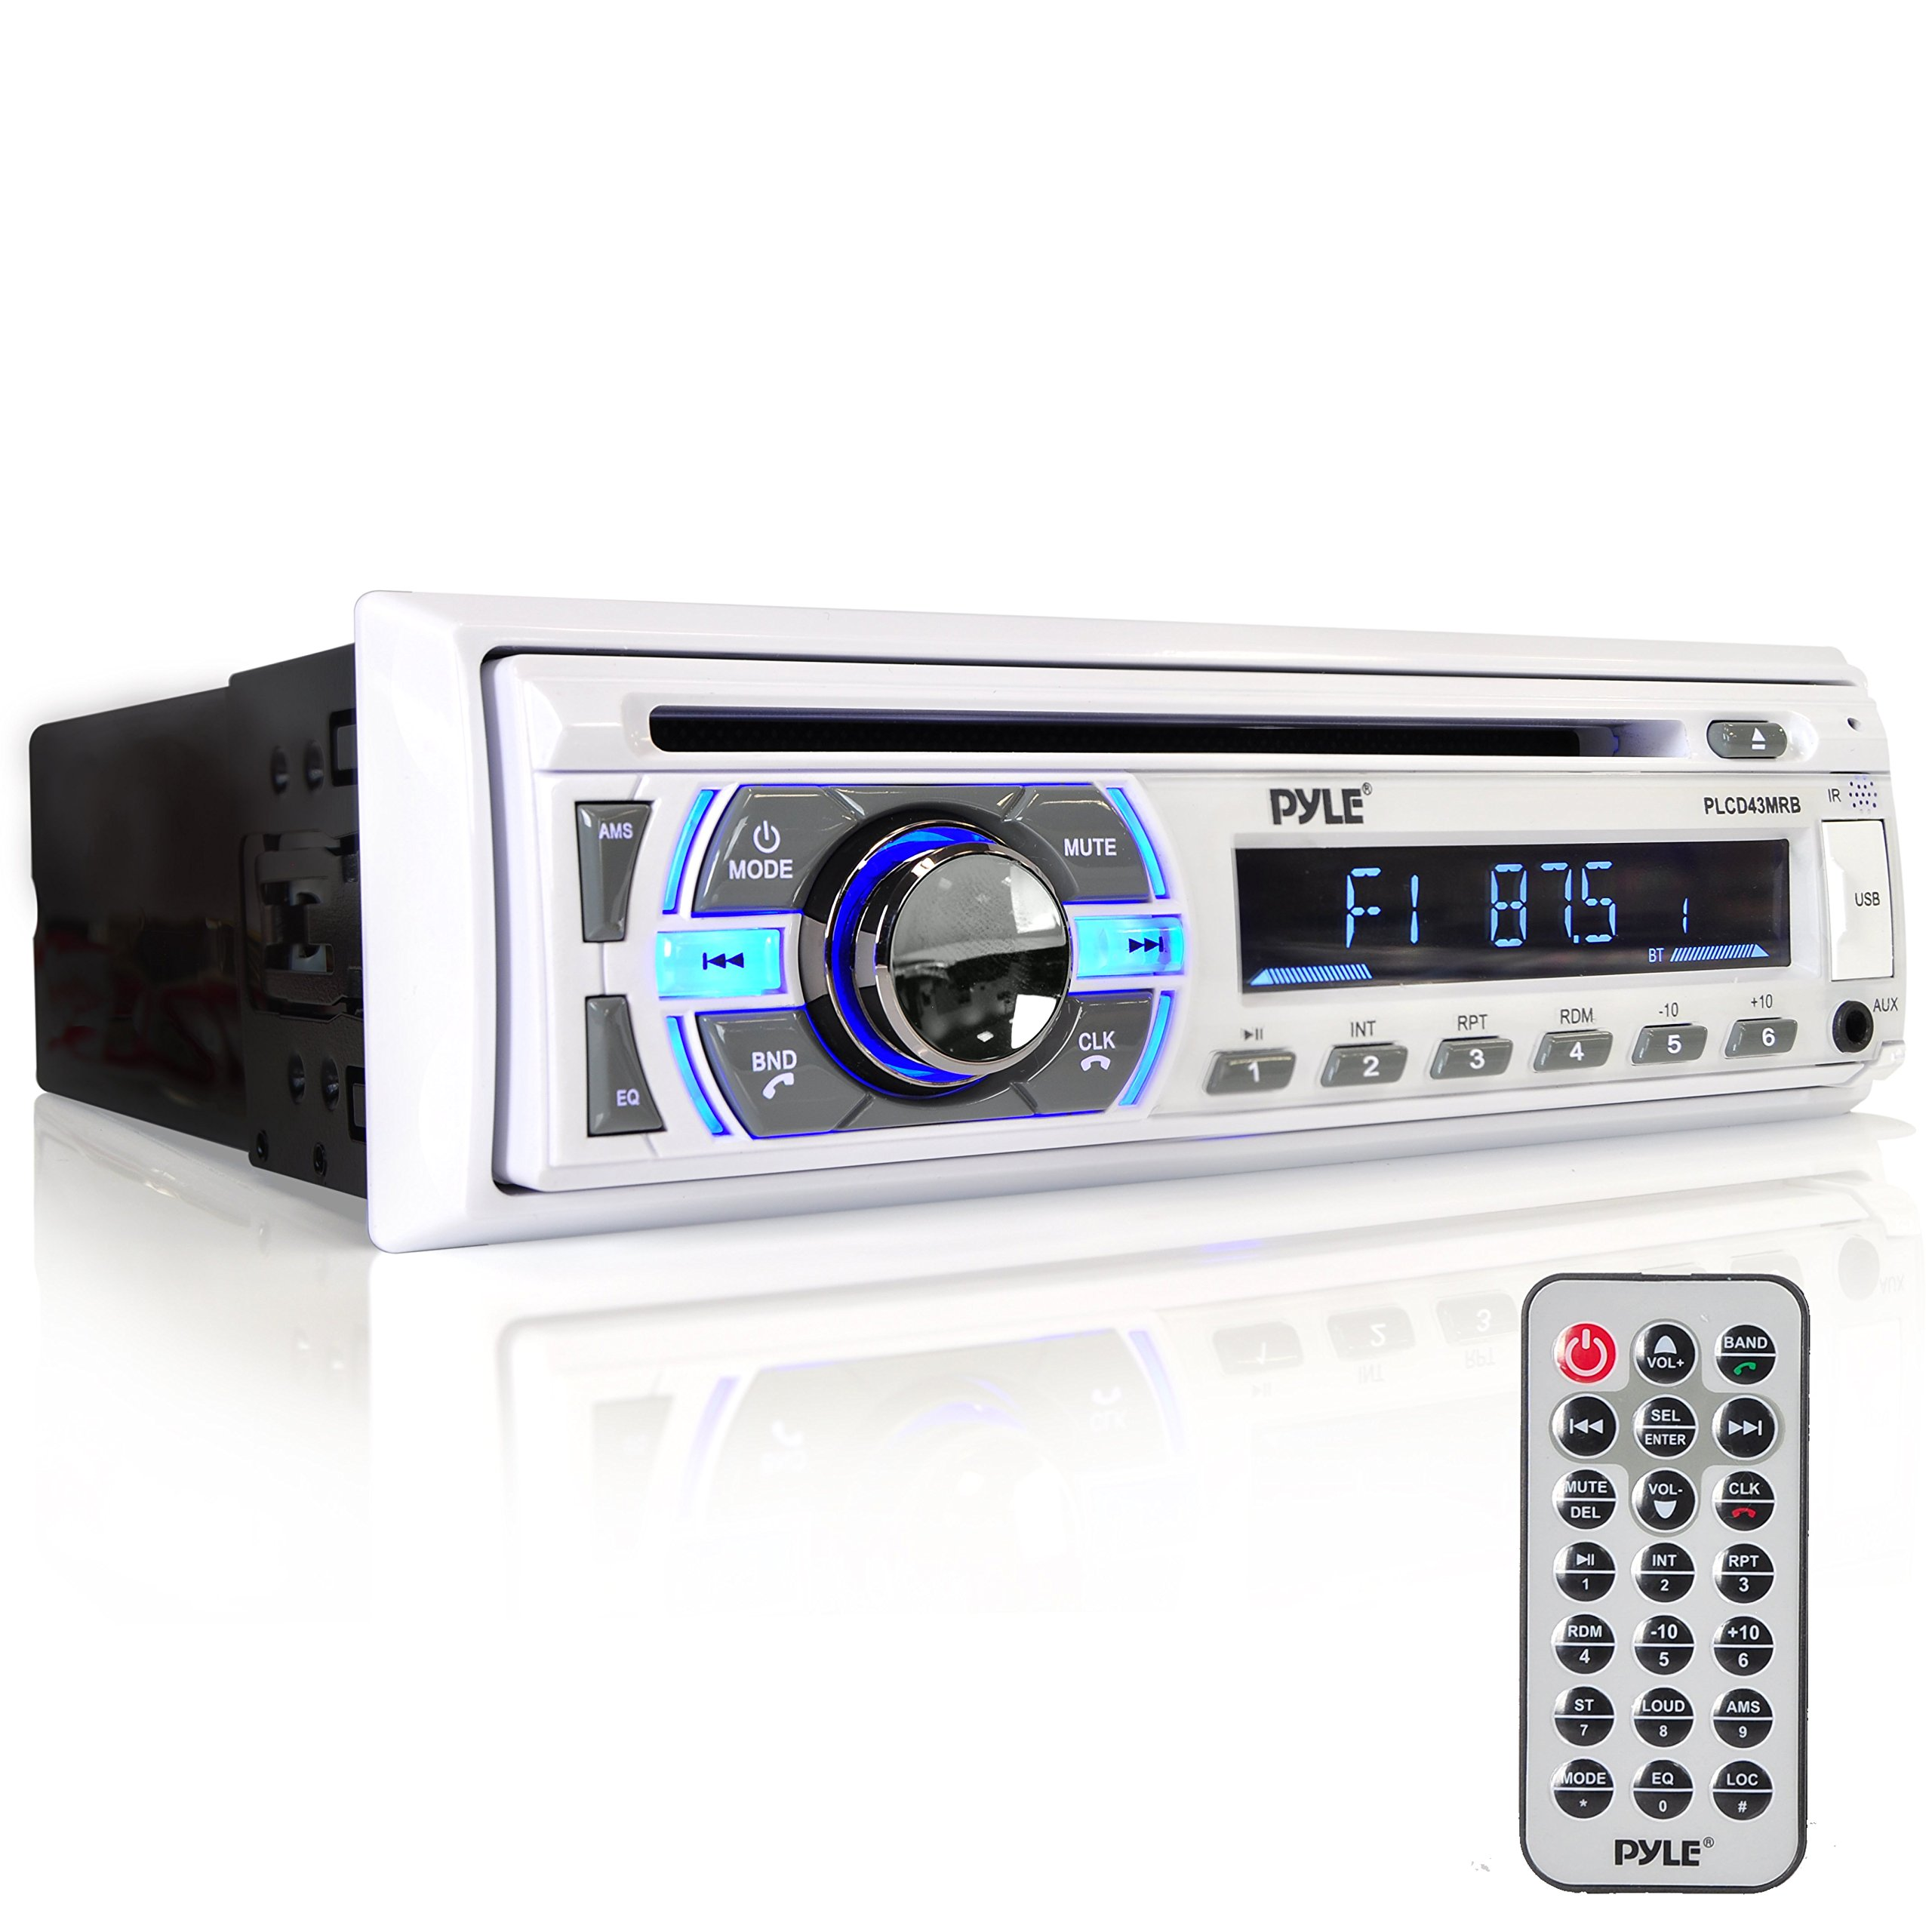 Pyle Bluetooth Streaming Hands Free PLCD43MRB